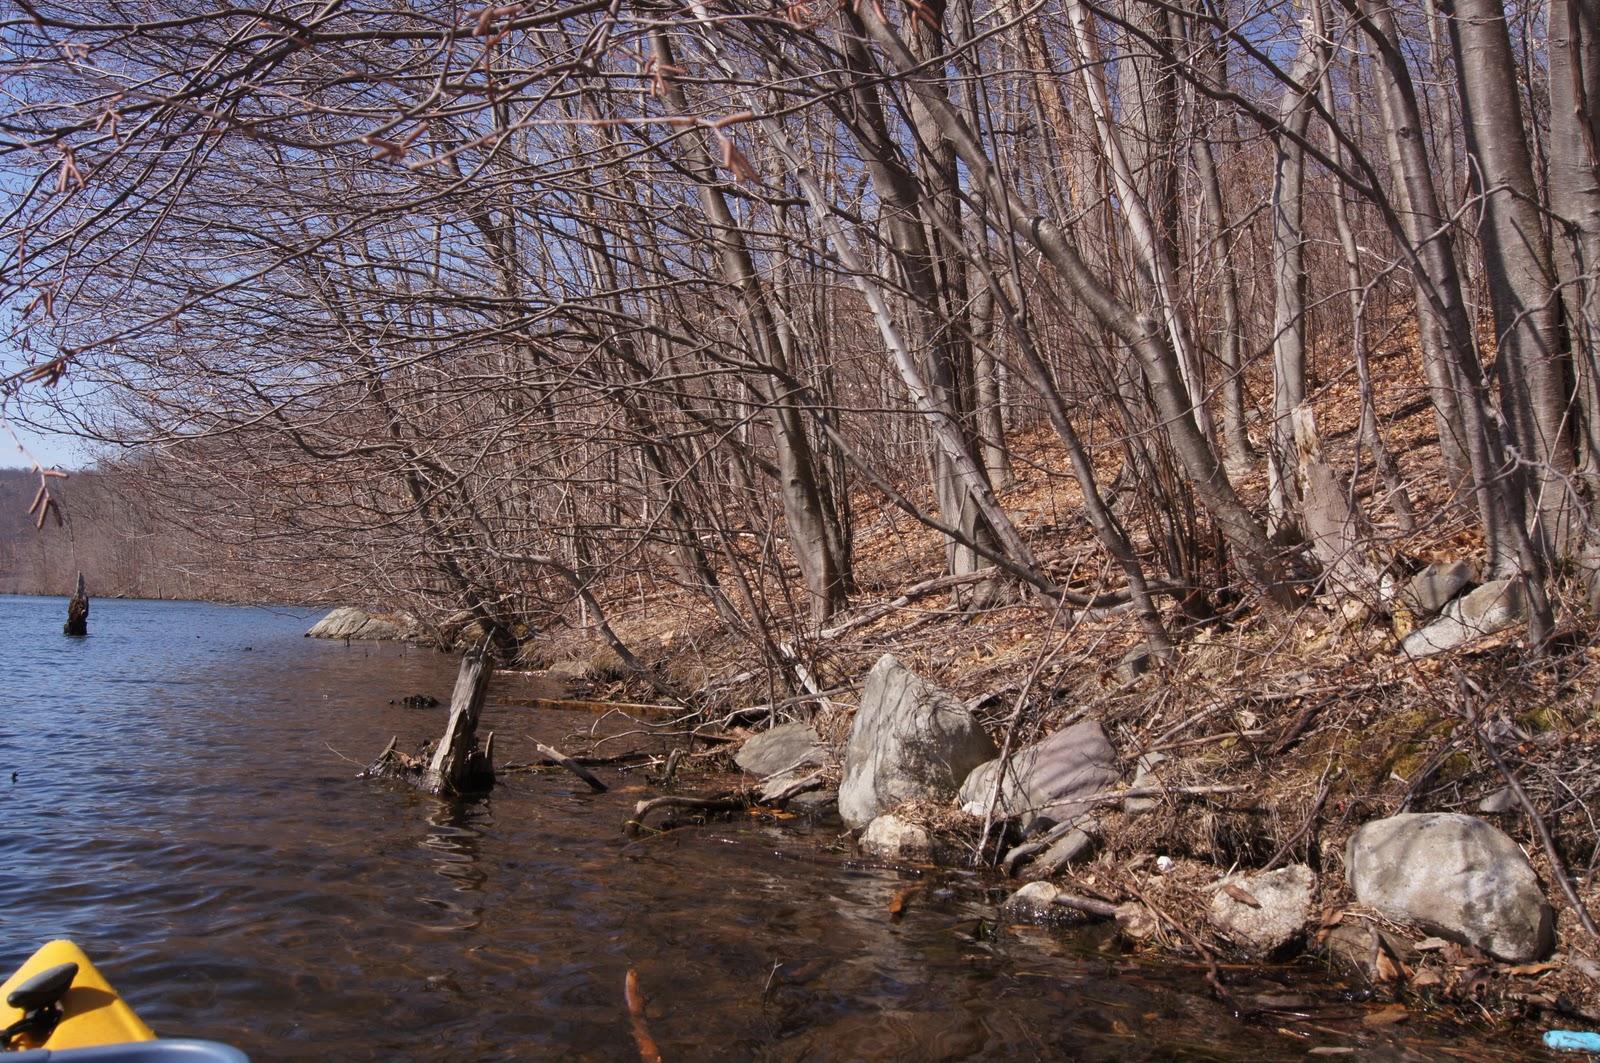 Kayak Northeast: Monksville Reservoir, Ringwood NJ - March 26th 2011